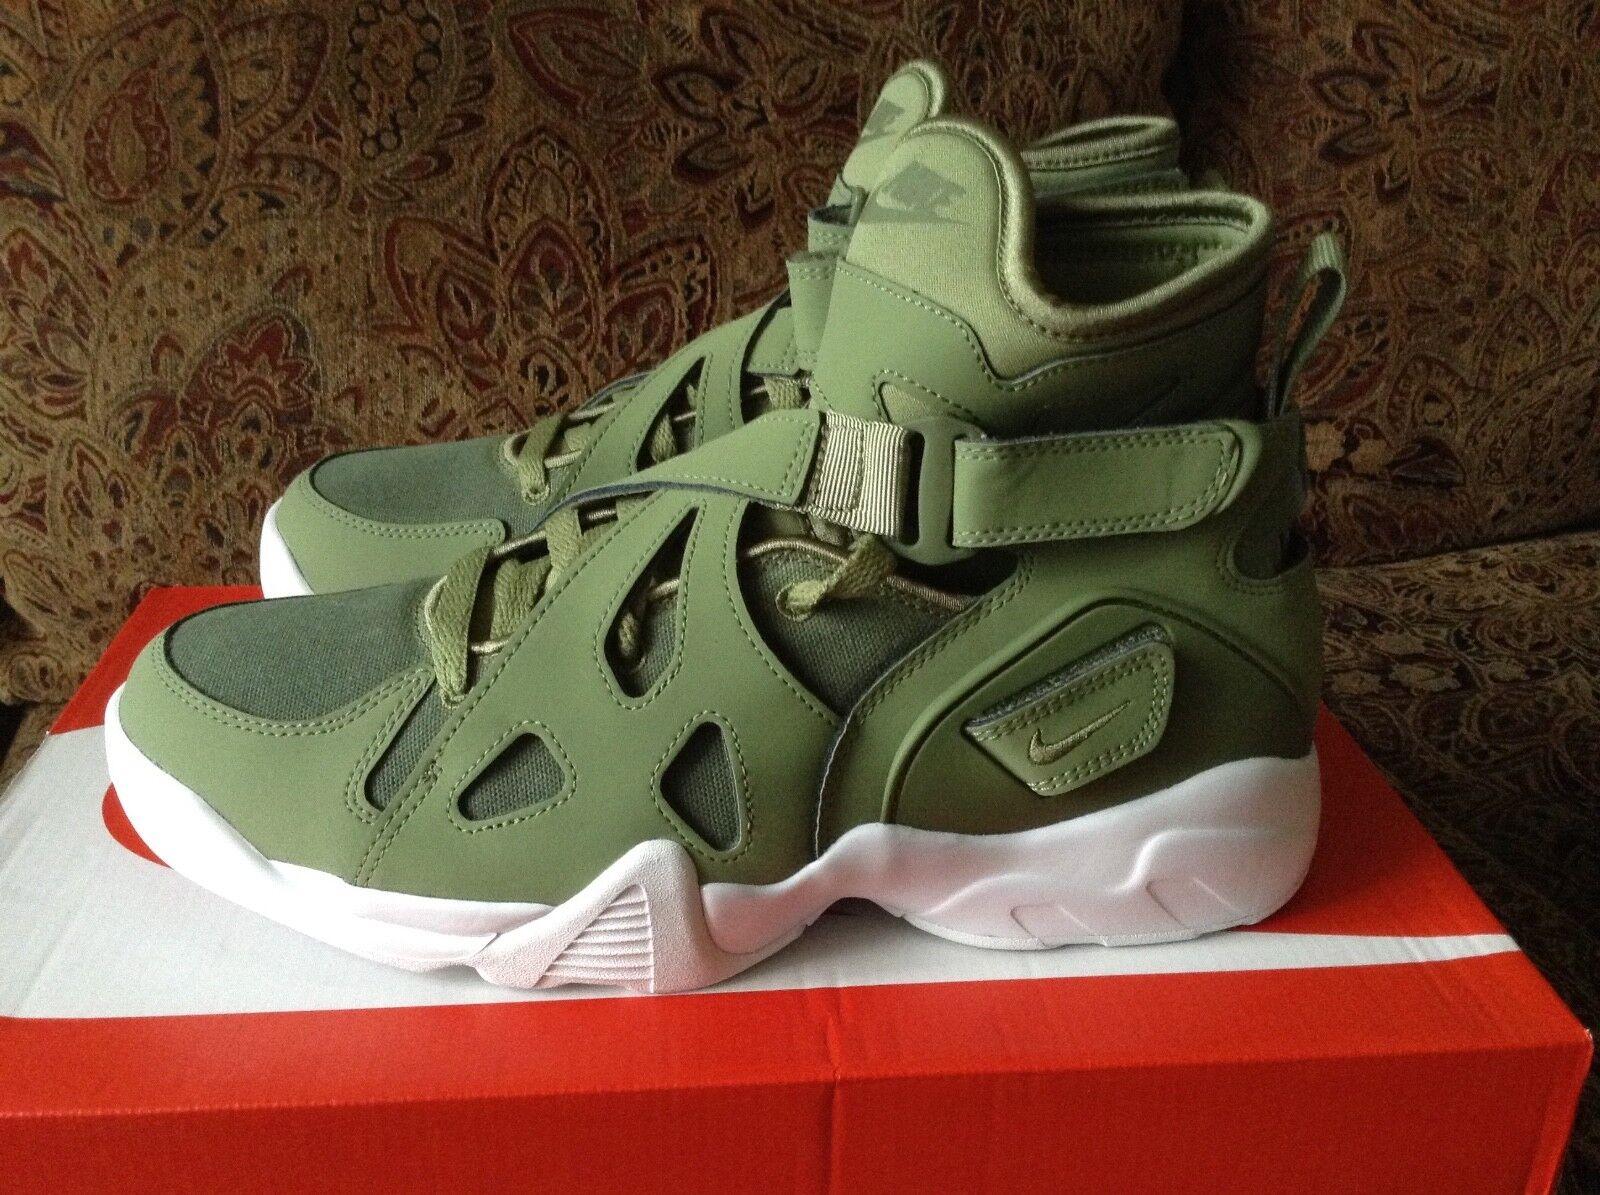 Nike Air Unlimited David Robinson Palm Green 889013-300 Size 8.5